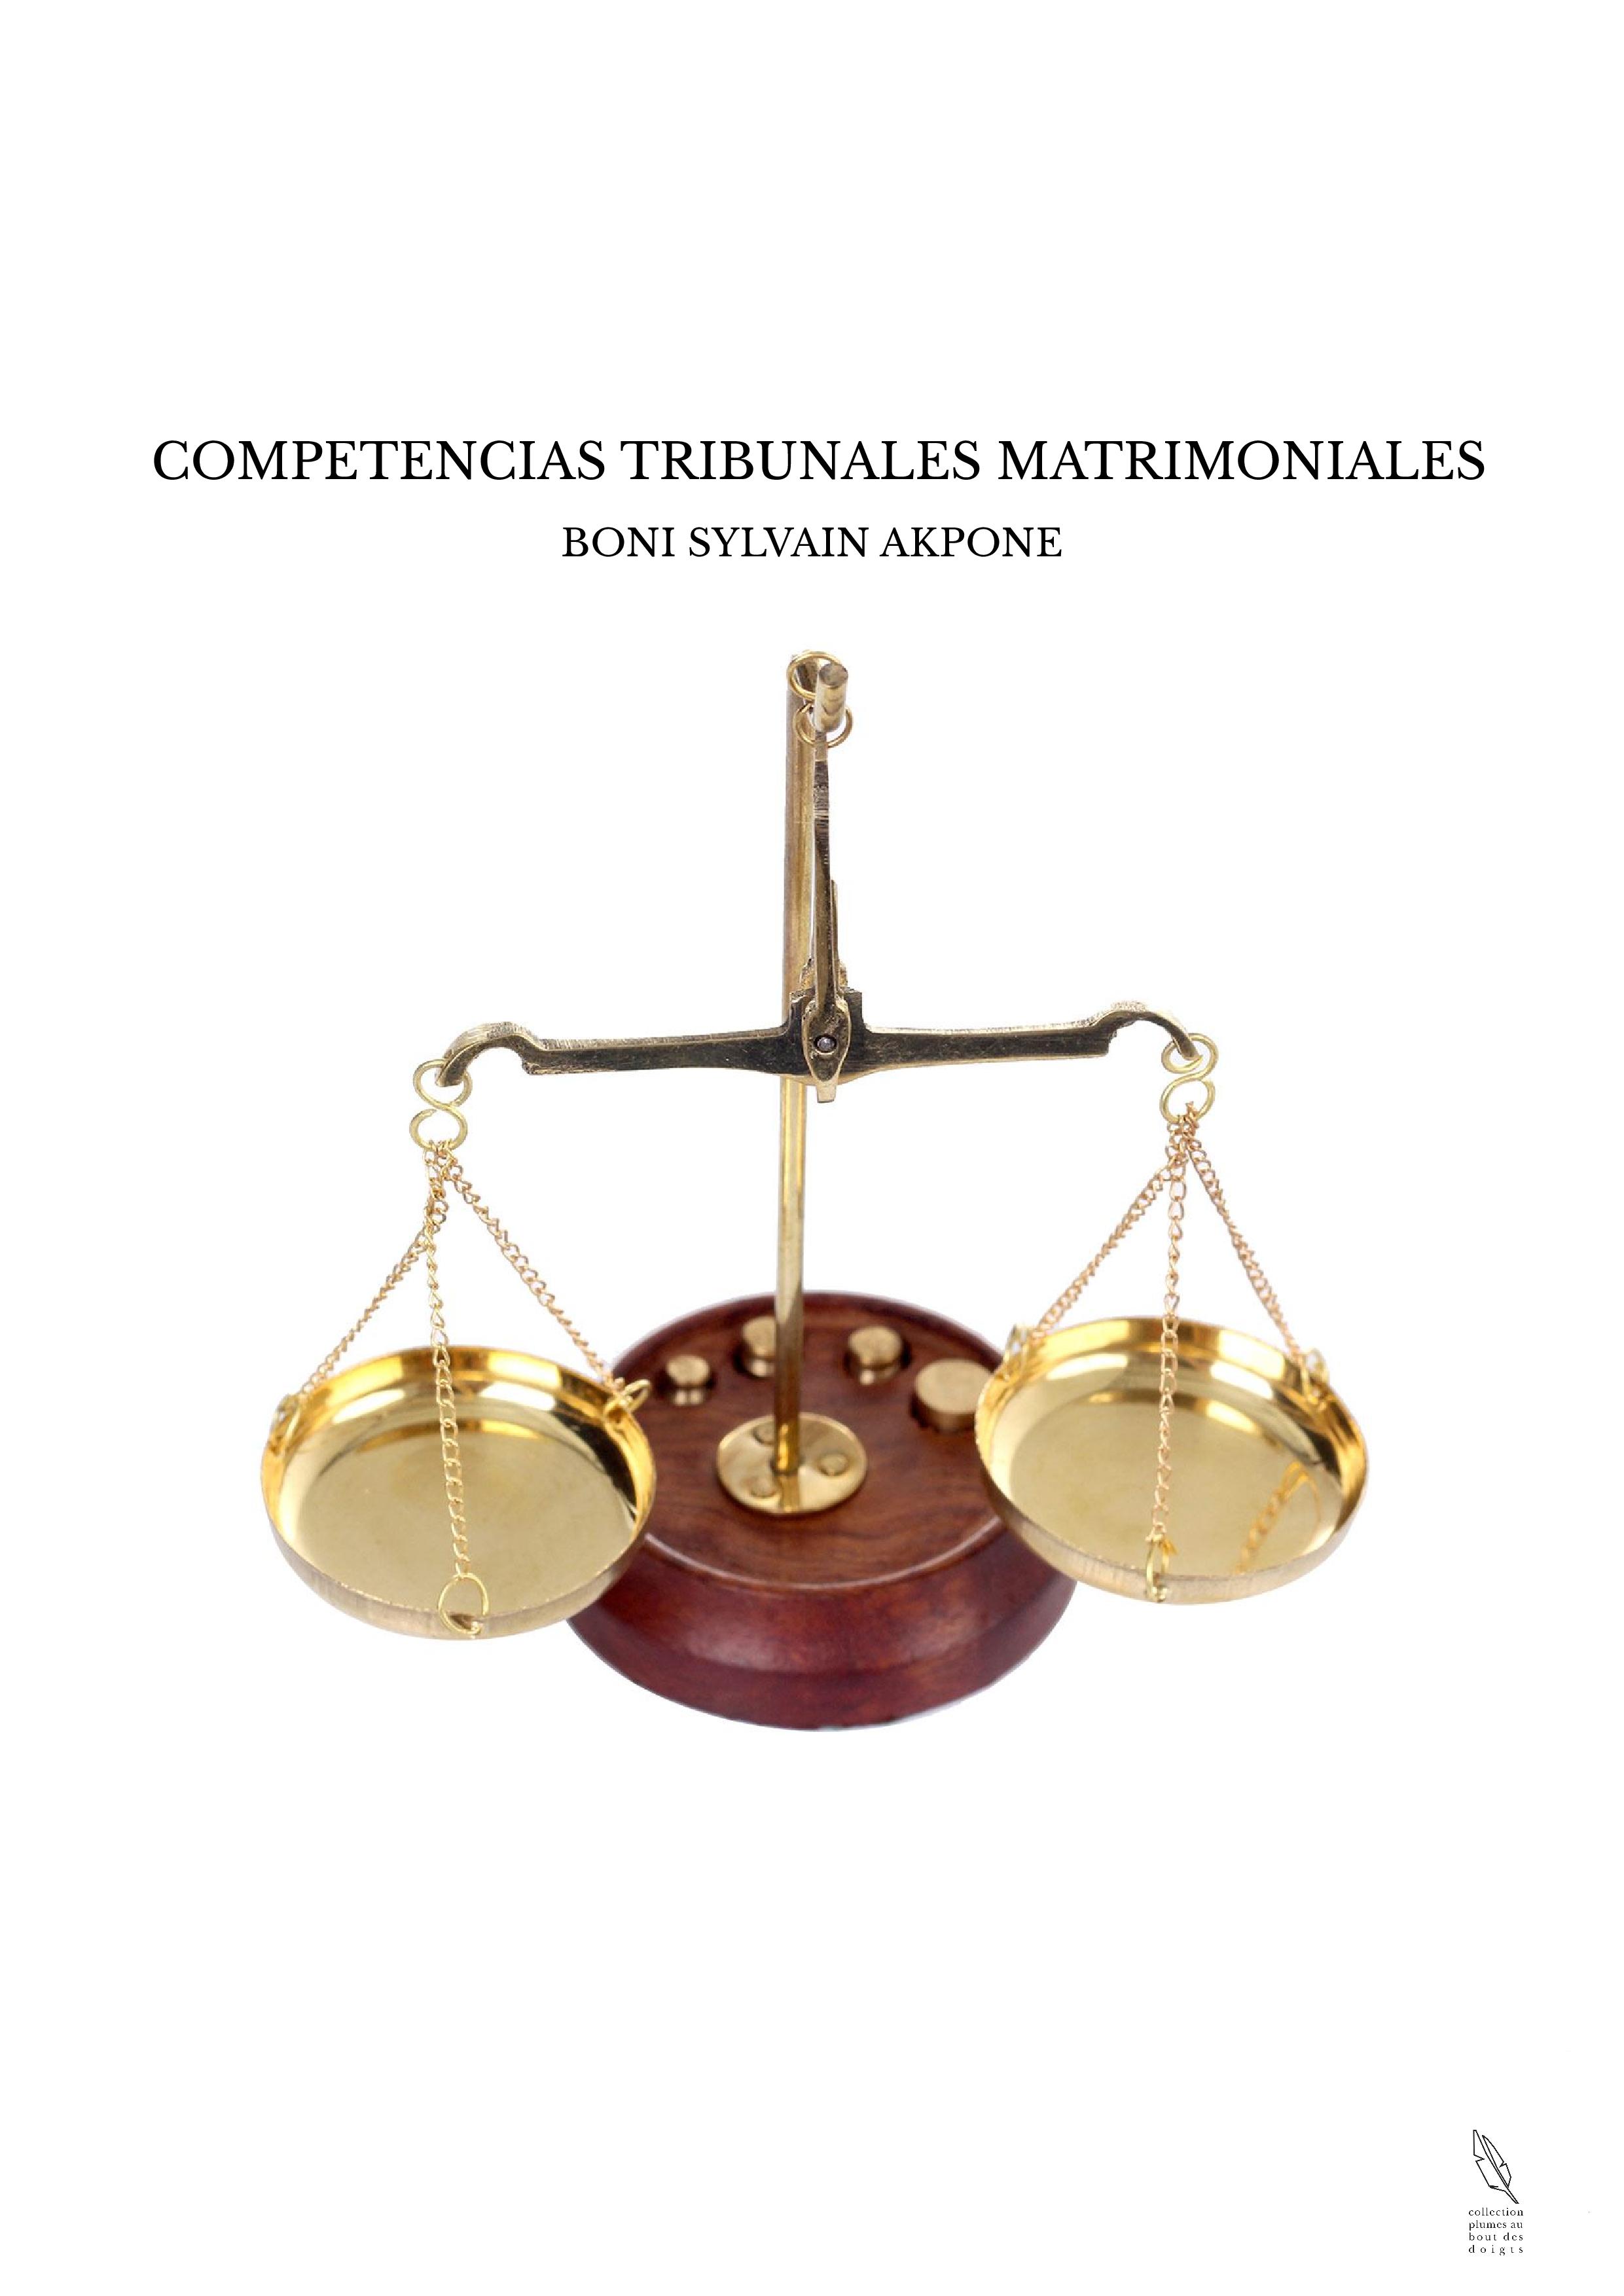 COMPETENCIAS TRIBUNALES MATRIMONIALES